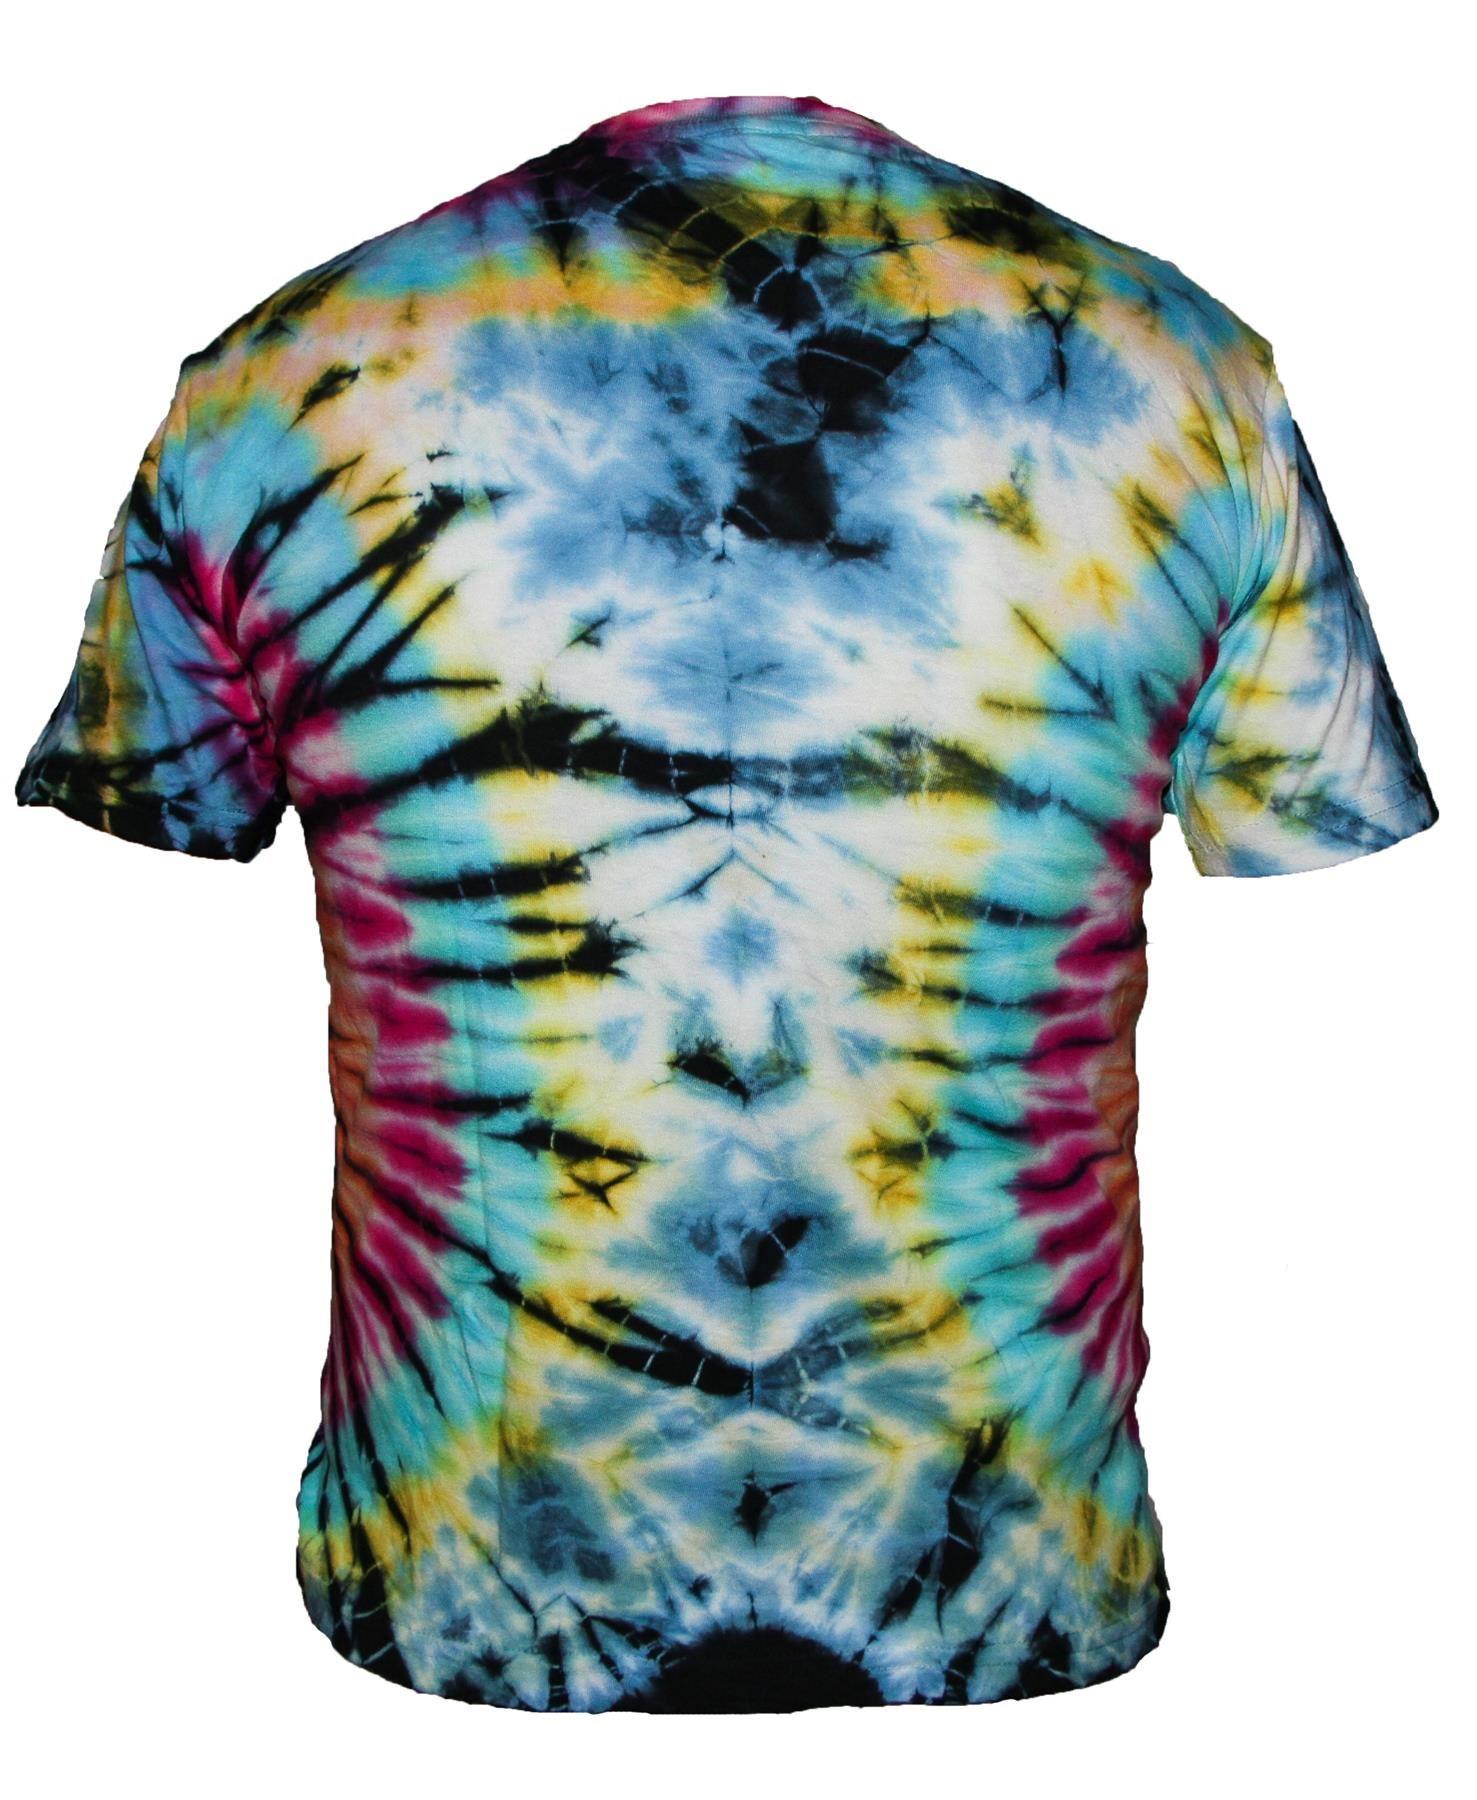 Tie-Dye-T-Shirt-Music-Festival-Tye-Dye-Tee-Hipster-Retro-Unisex-Short-Sleeve-Top thumbnail 17